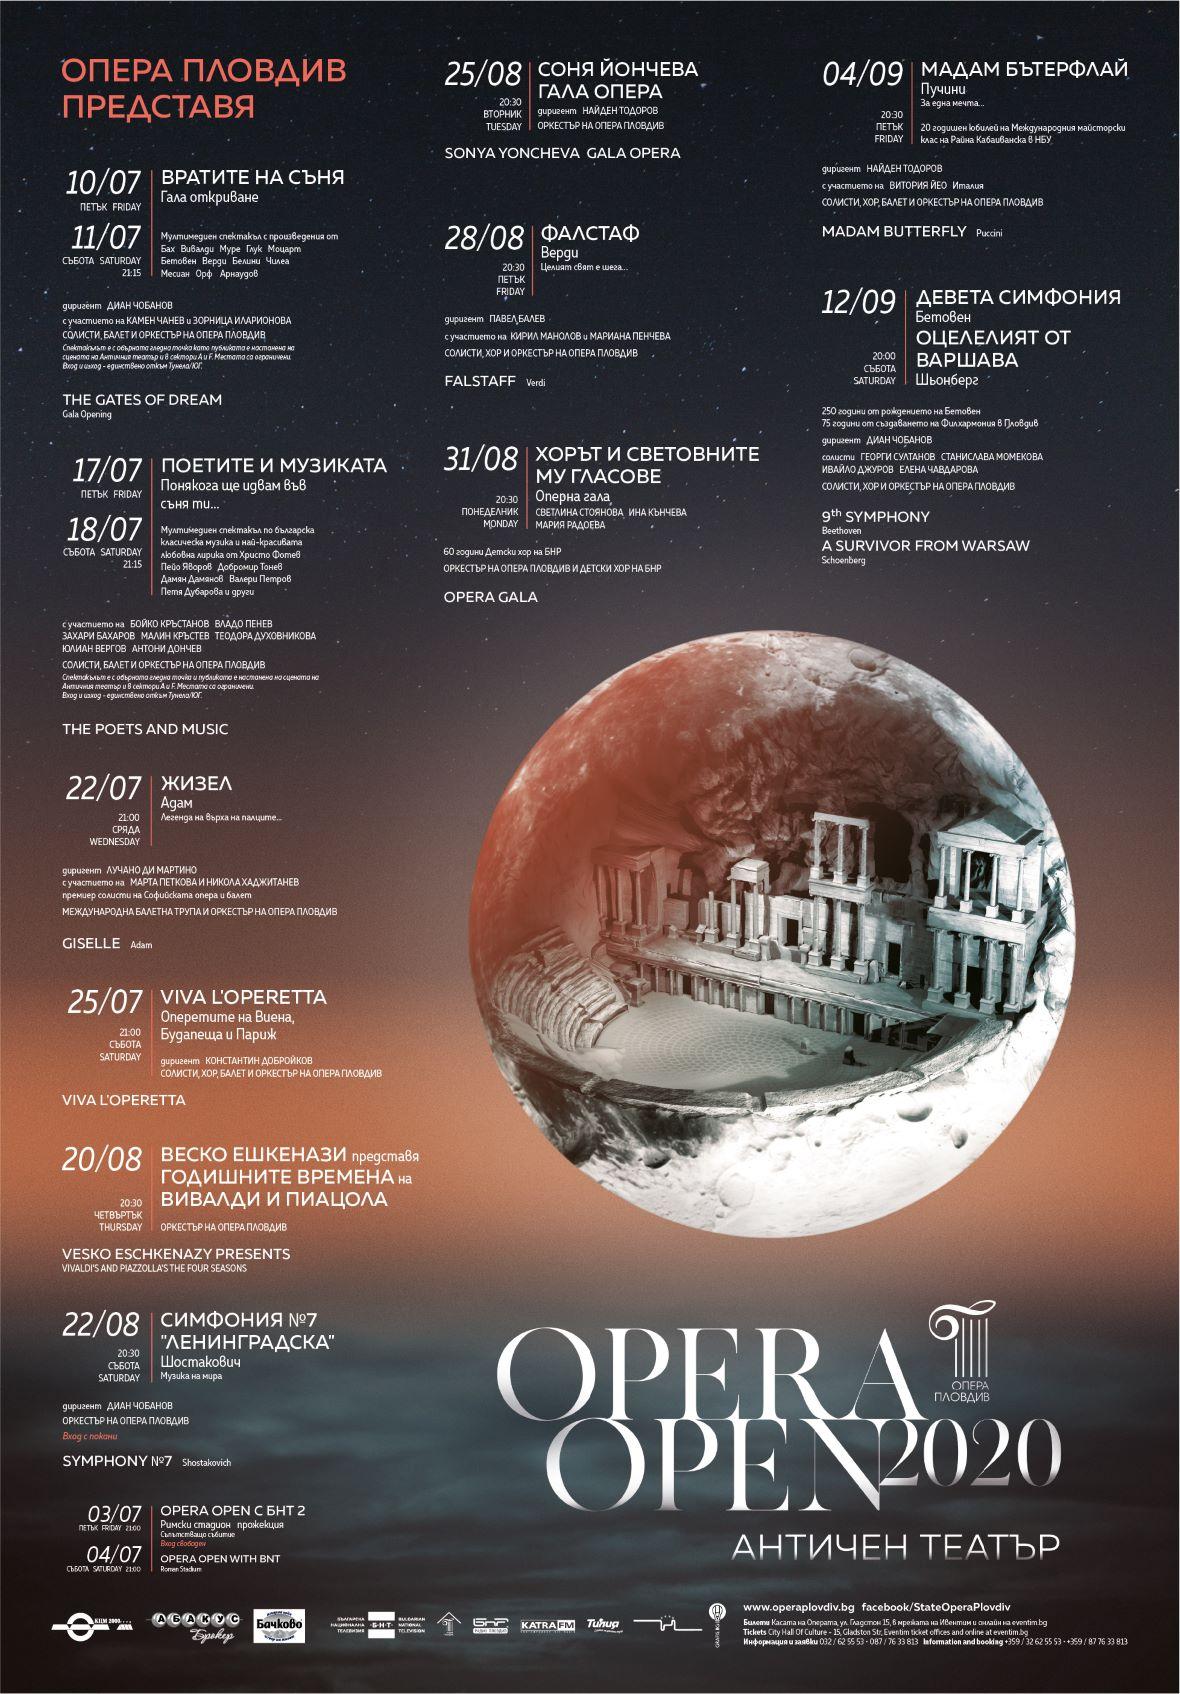 OPERA OPEN 2020 presents the big Bulgarian names in the opera